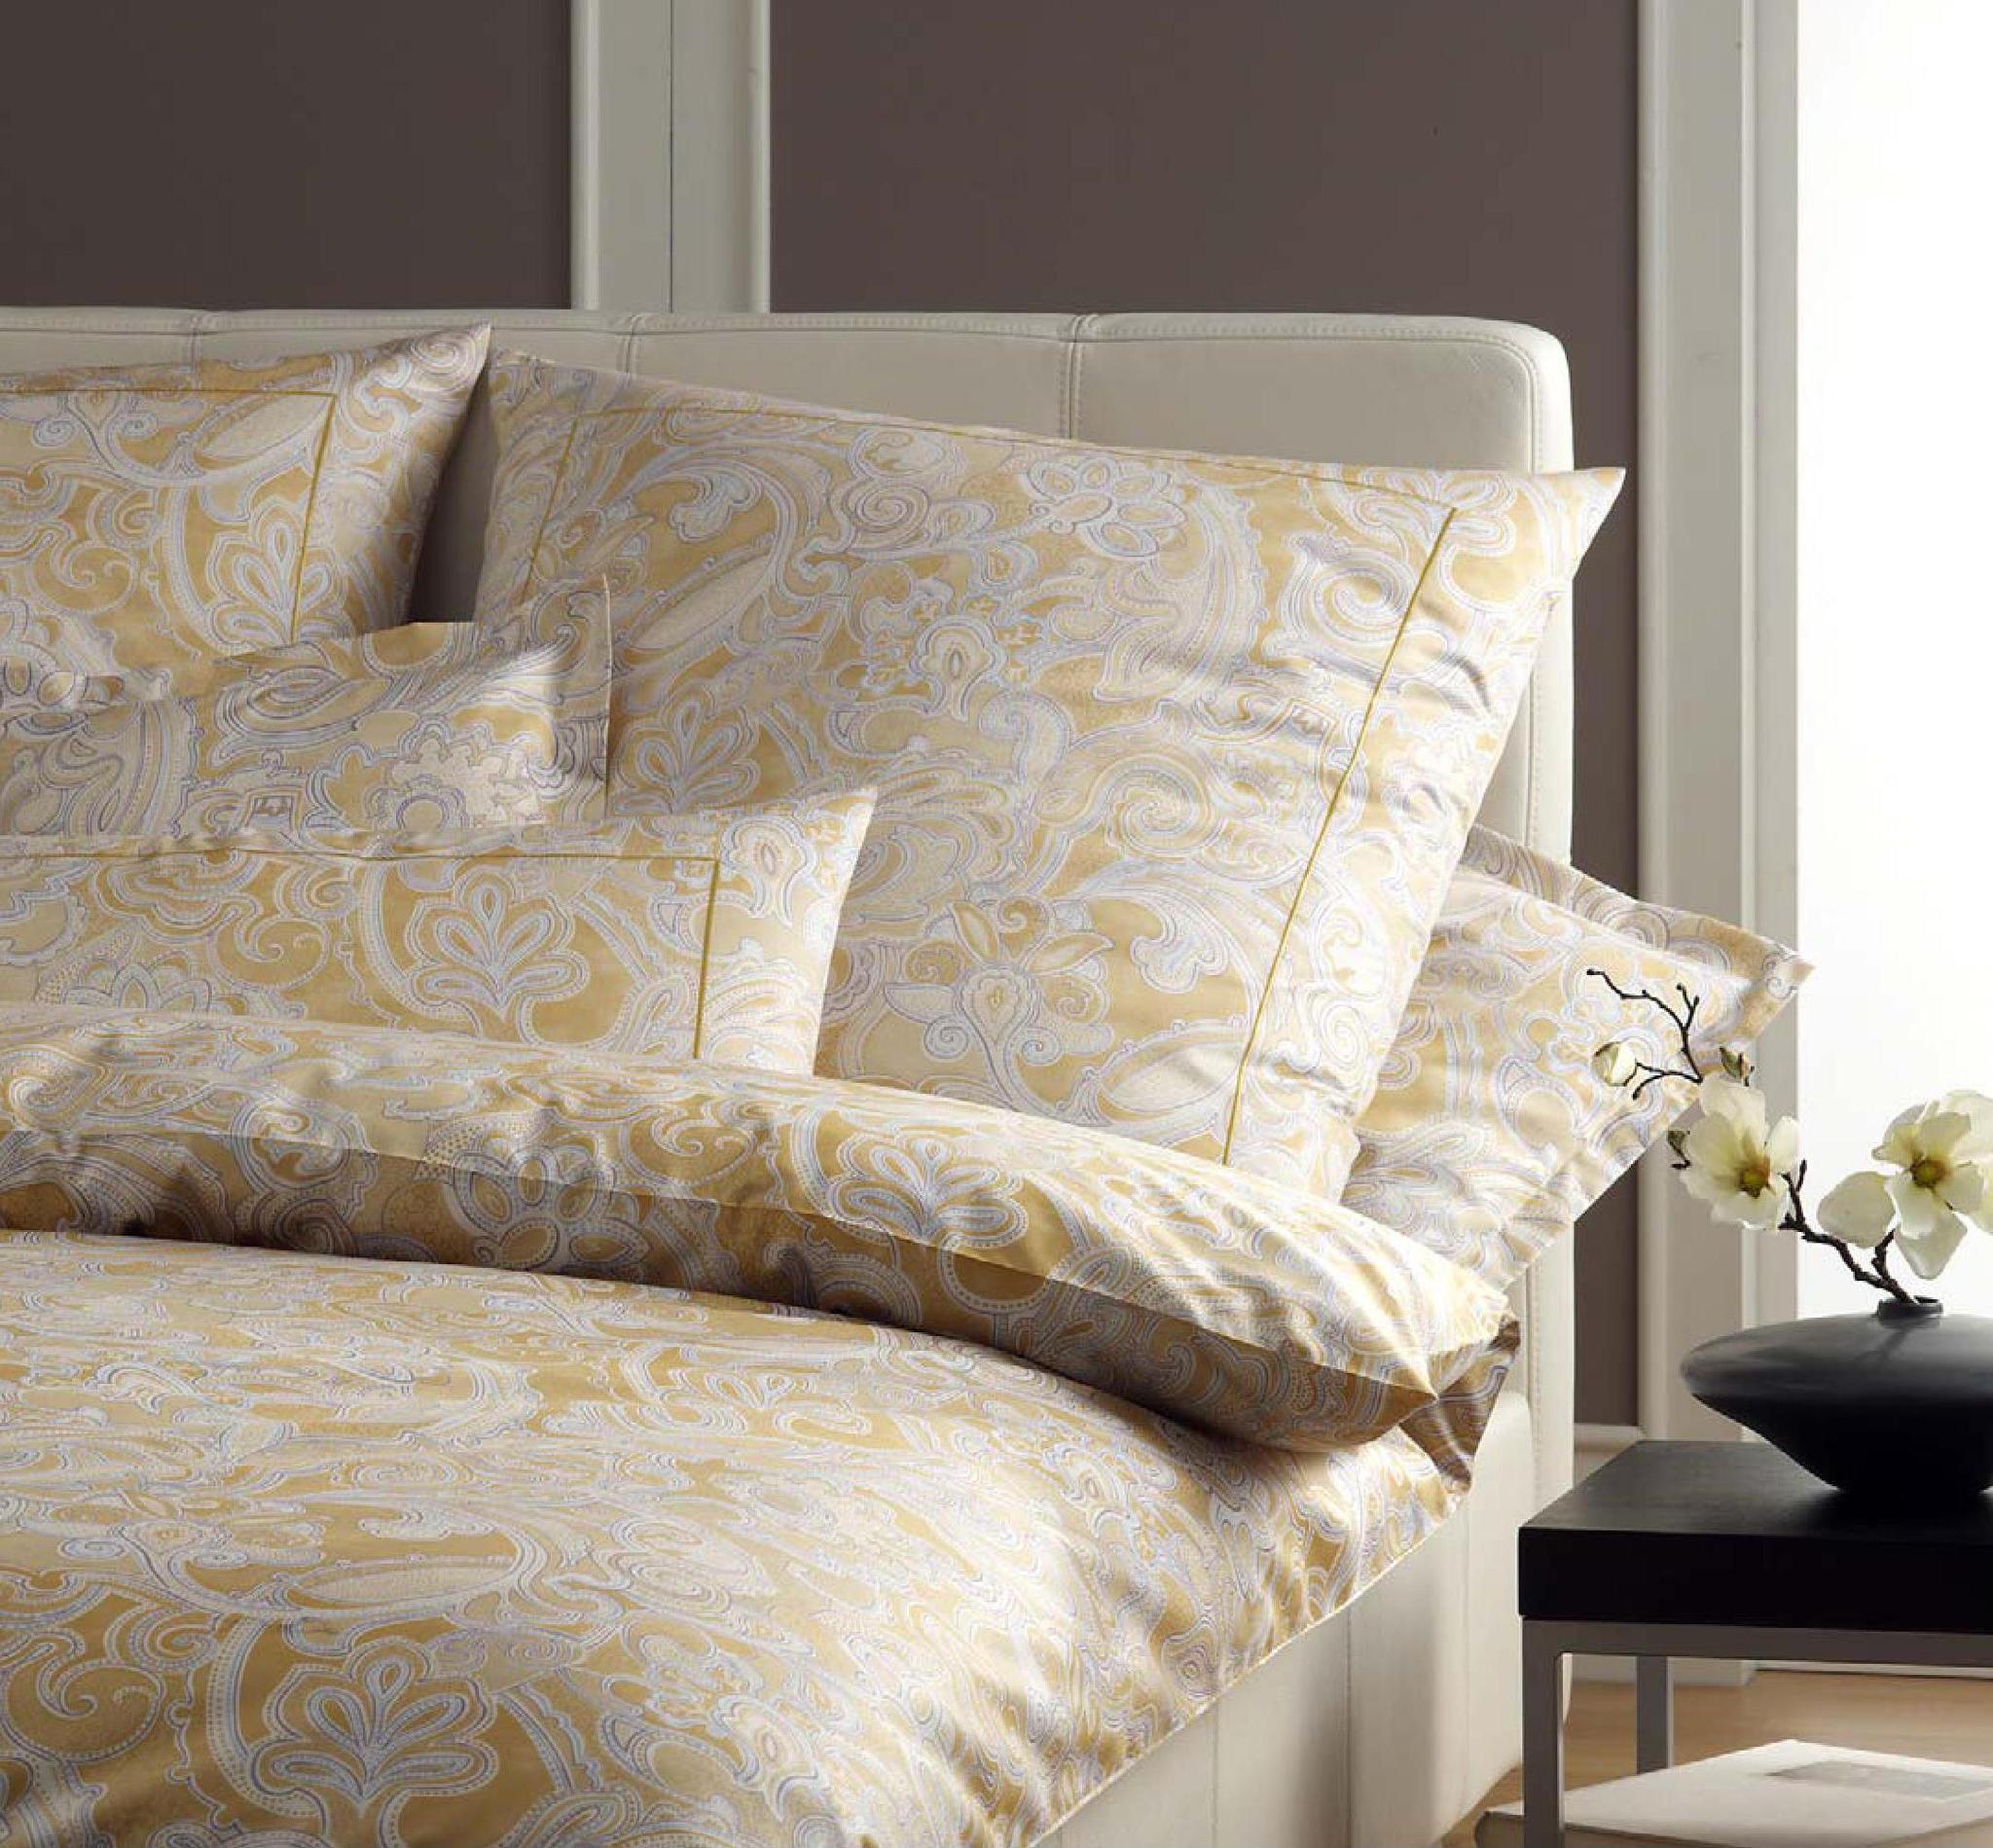 Наволочки для сна Наволочка 50x70 Elegante Isfahan золотая elitnaya-navolochka-isfahan-zolotaya-ot-elegante-germaniya.jpg